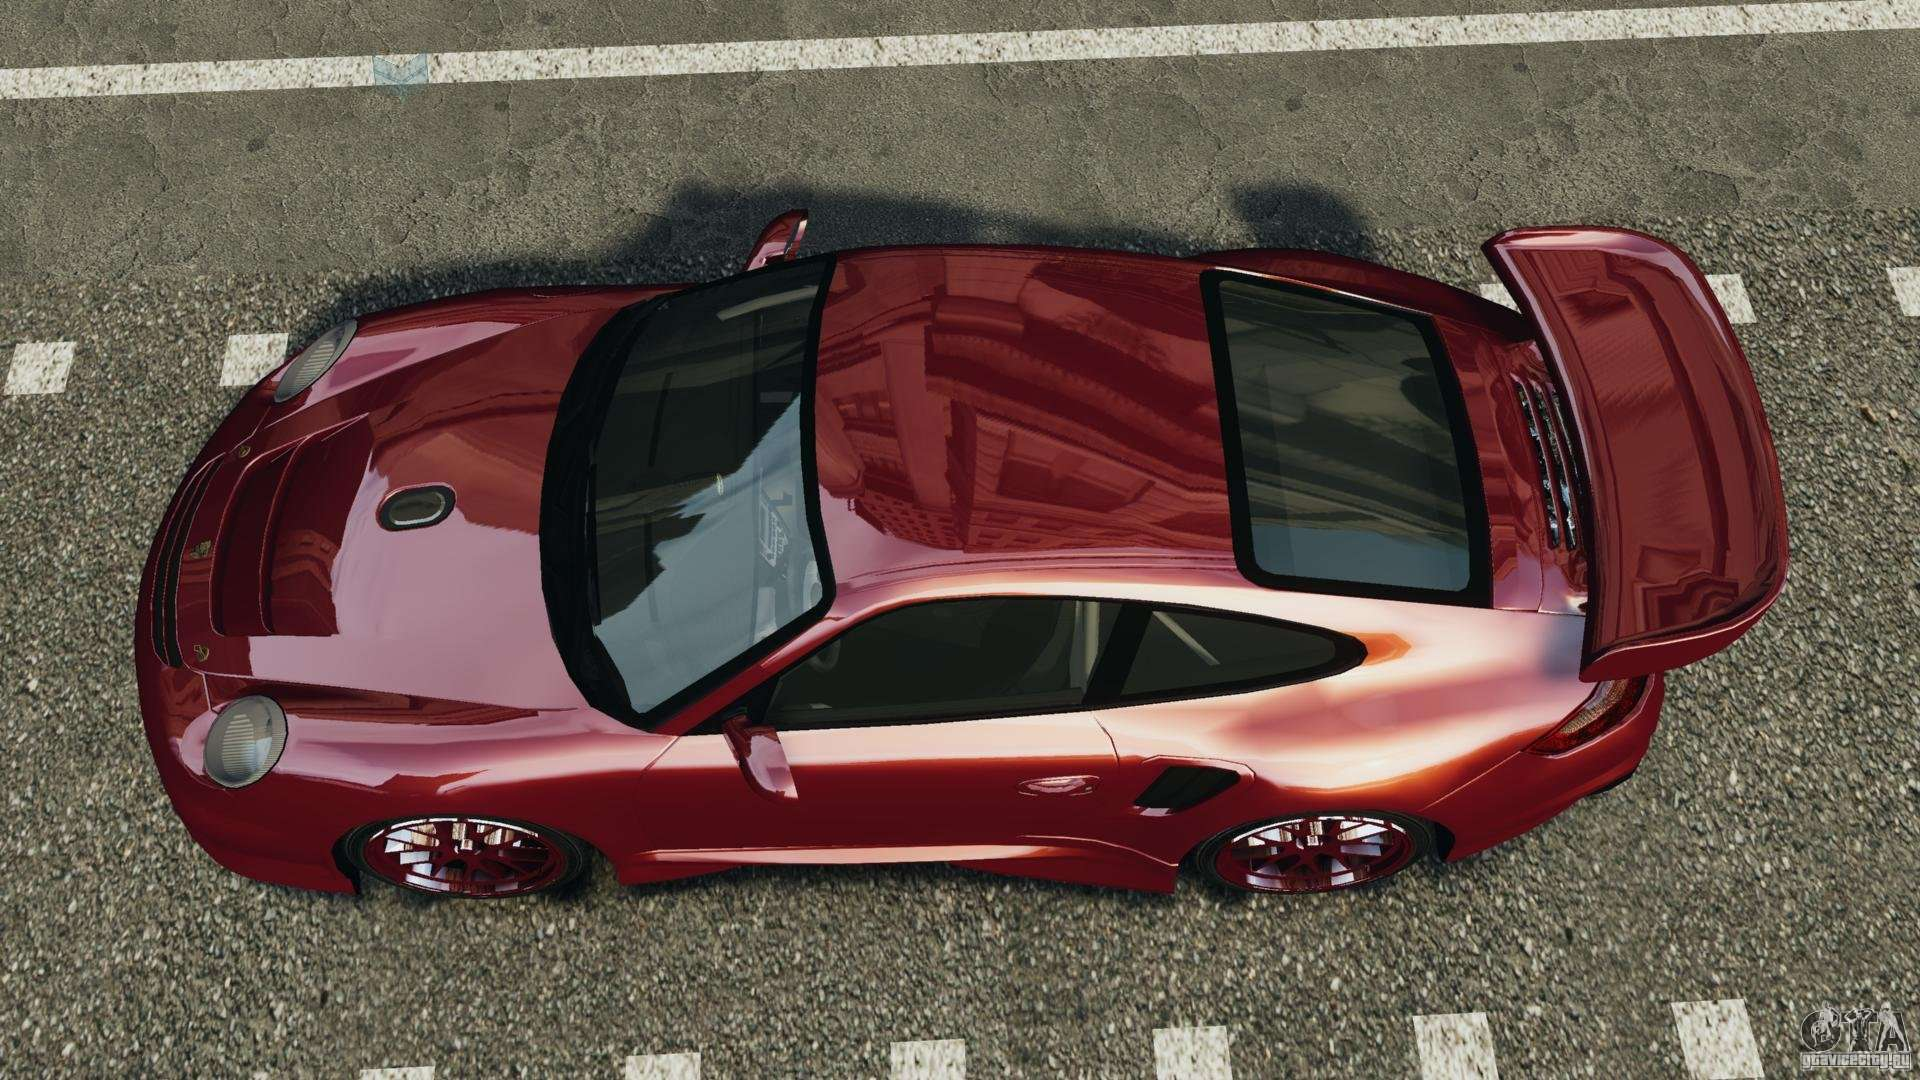 28488-1356693830-GTAIV2012-12-2814-42-46-72 Stunning Porsche 911 Gt2 Body Kit Cars Trend